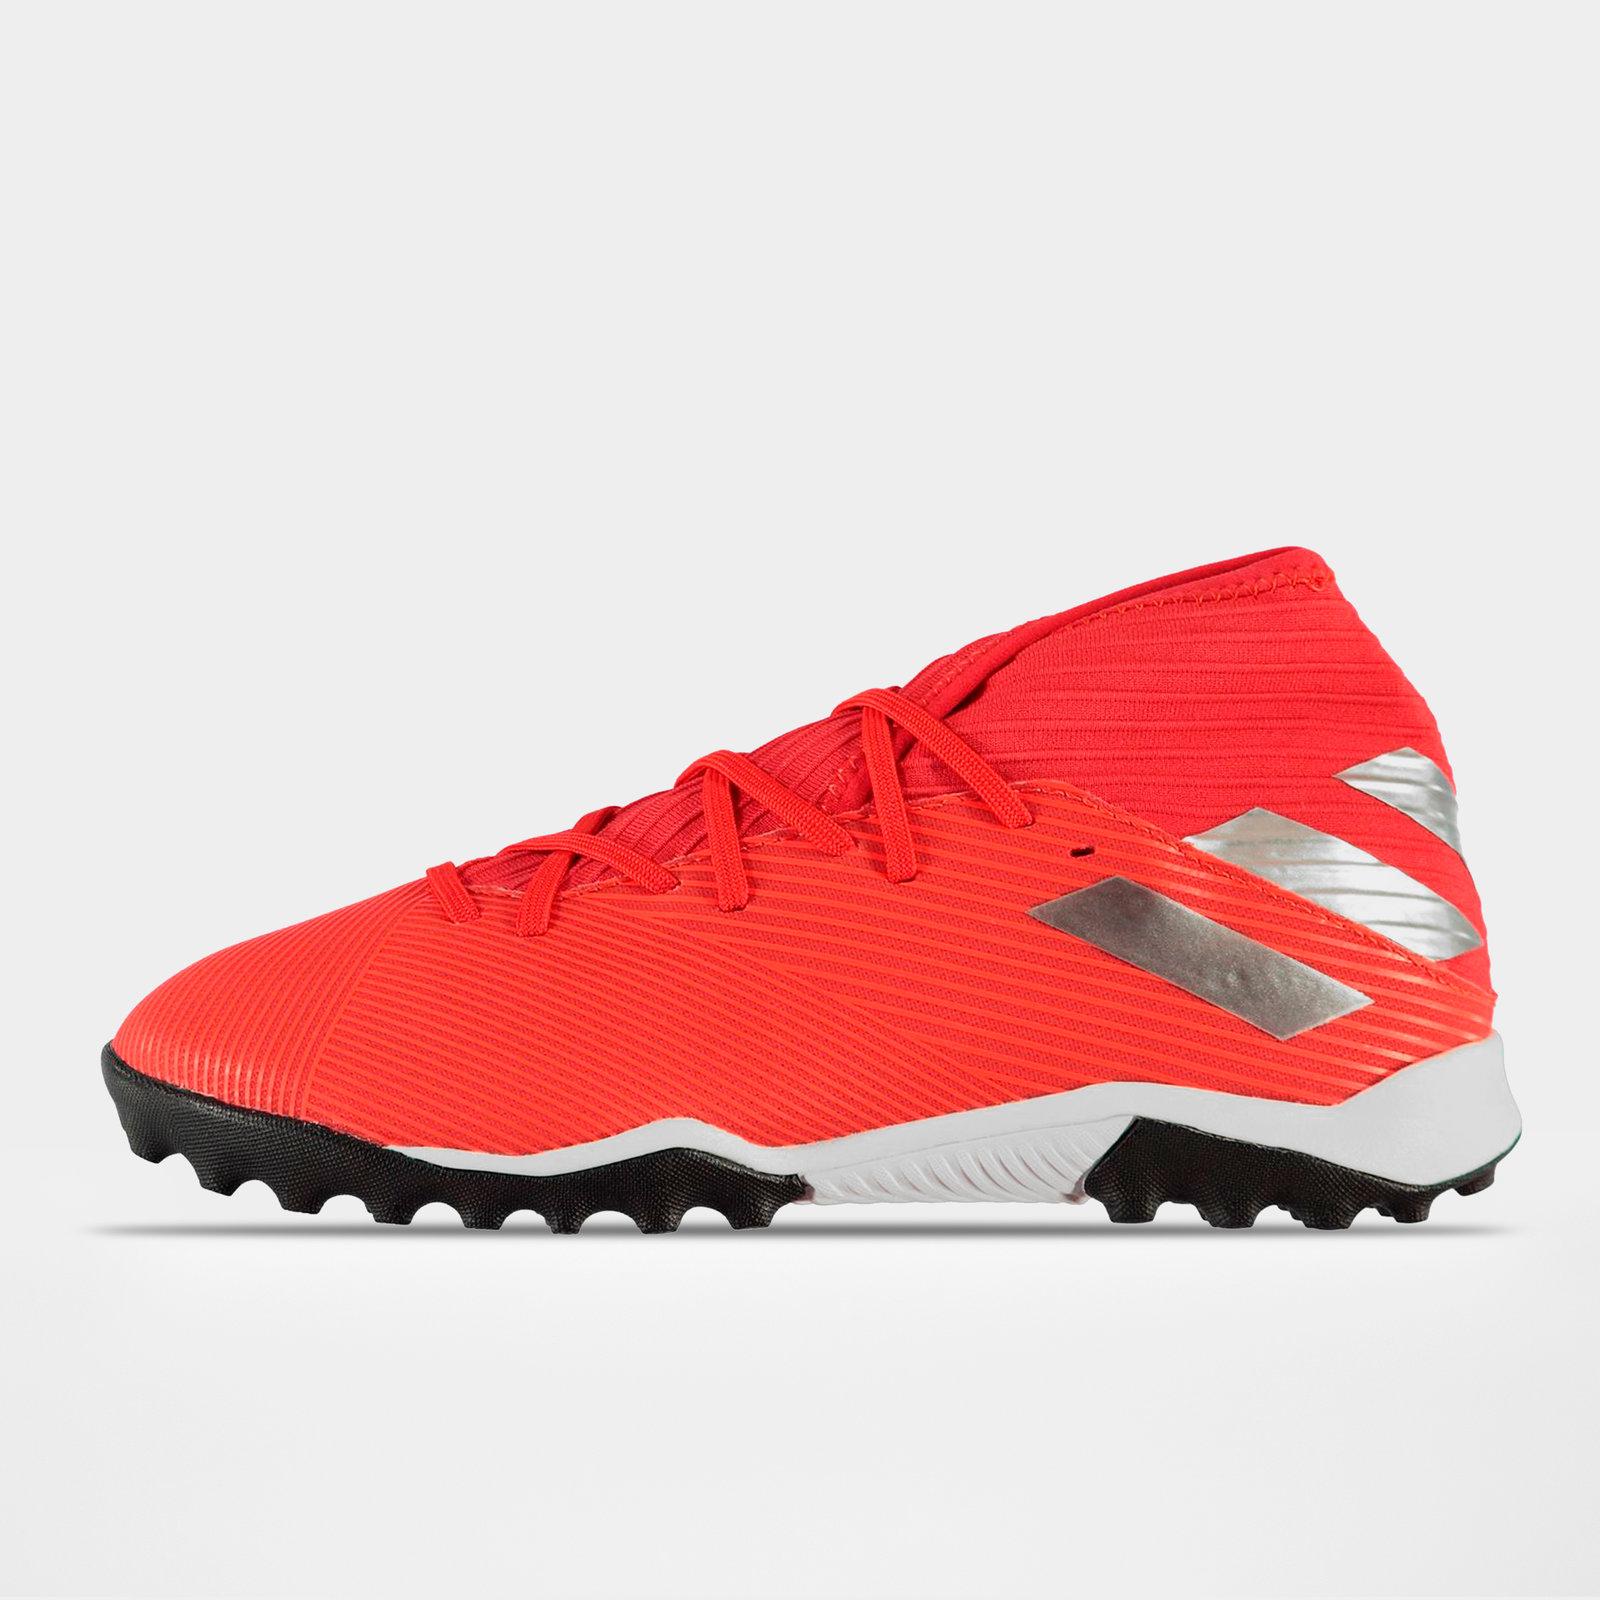 adidas Mens Nemeziz 19.3 Astro Turf Trainers Sports Shoes   eBay